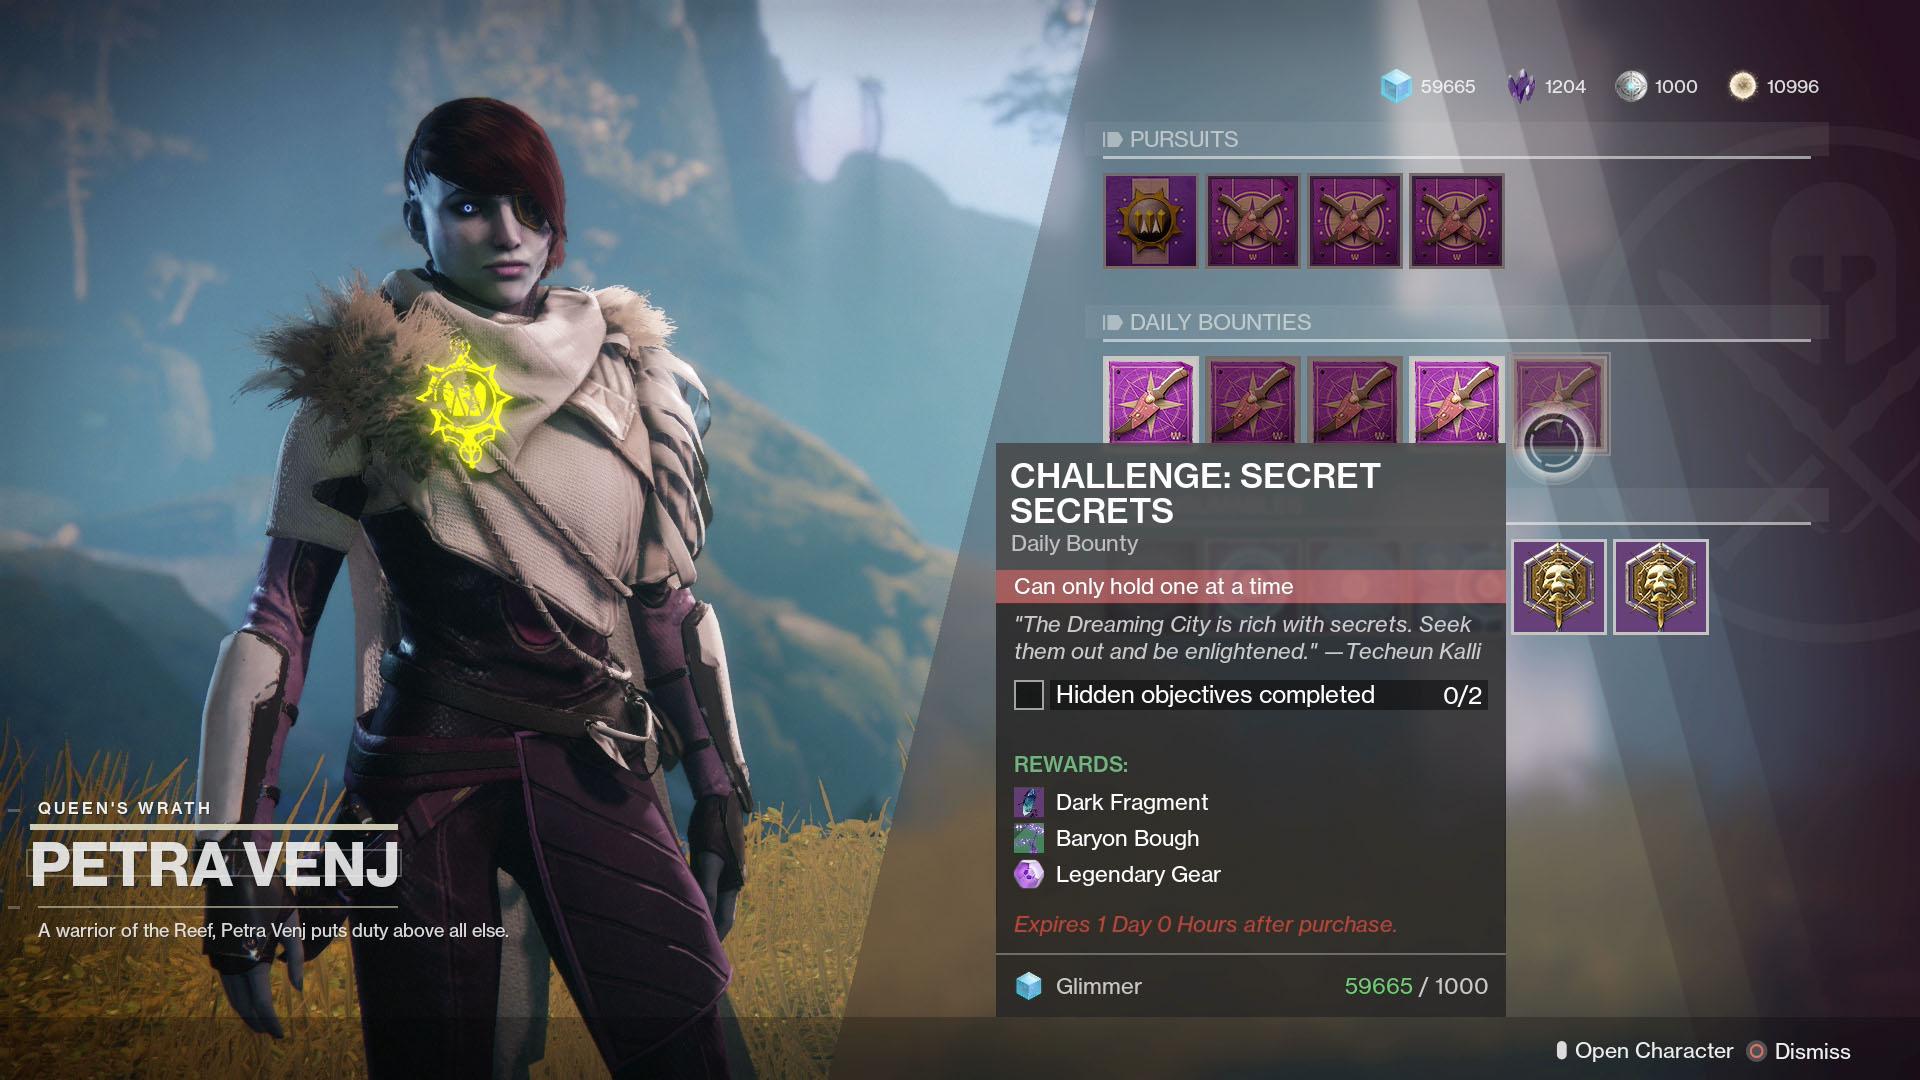 Destiny 2 Challenge Secret Secrets Daily Bounty Cat Amp Chest Locations